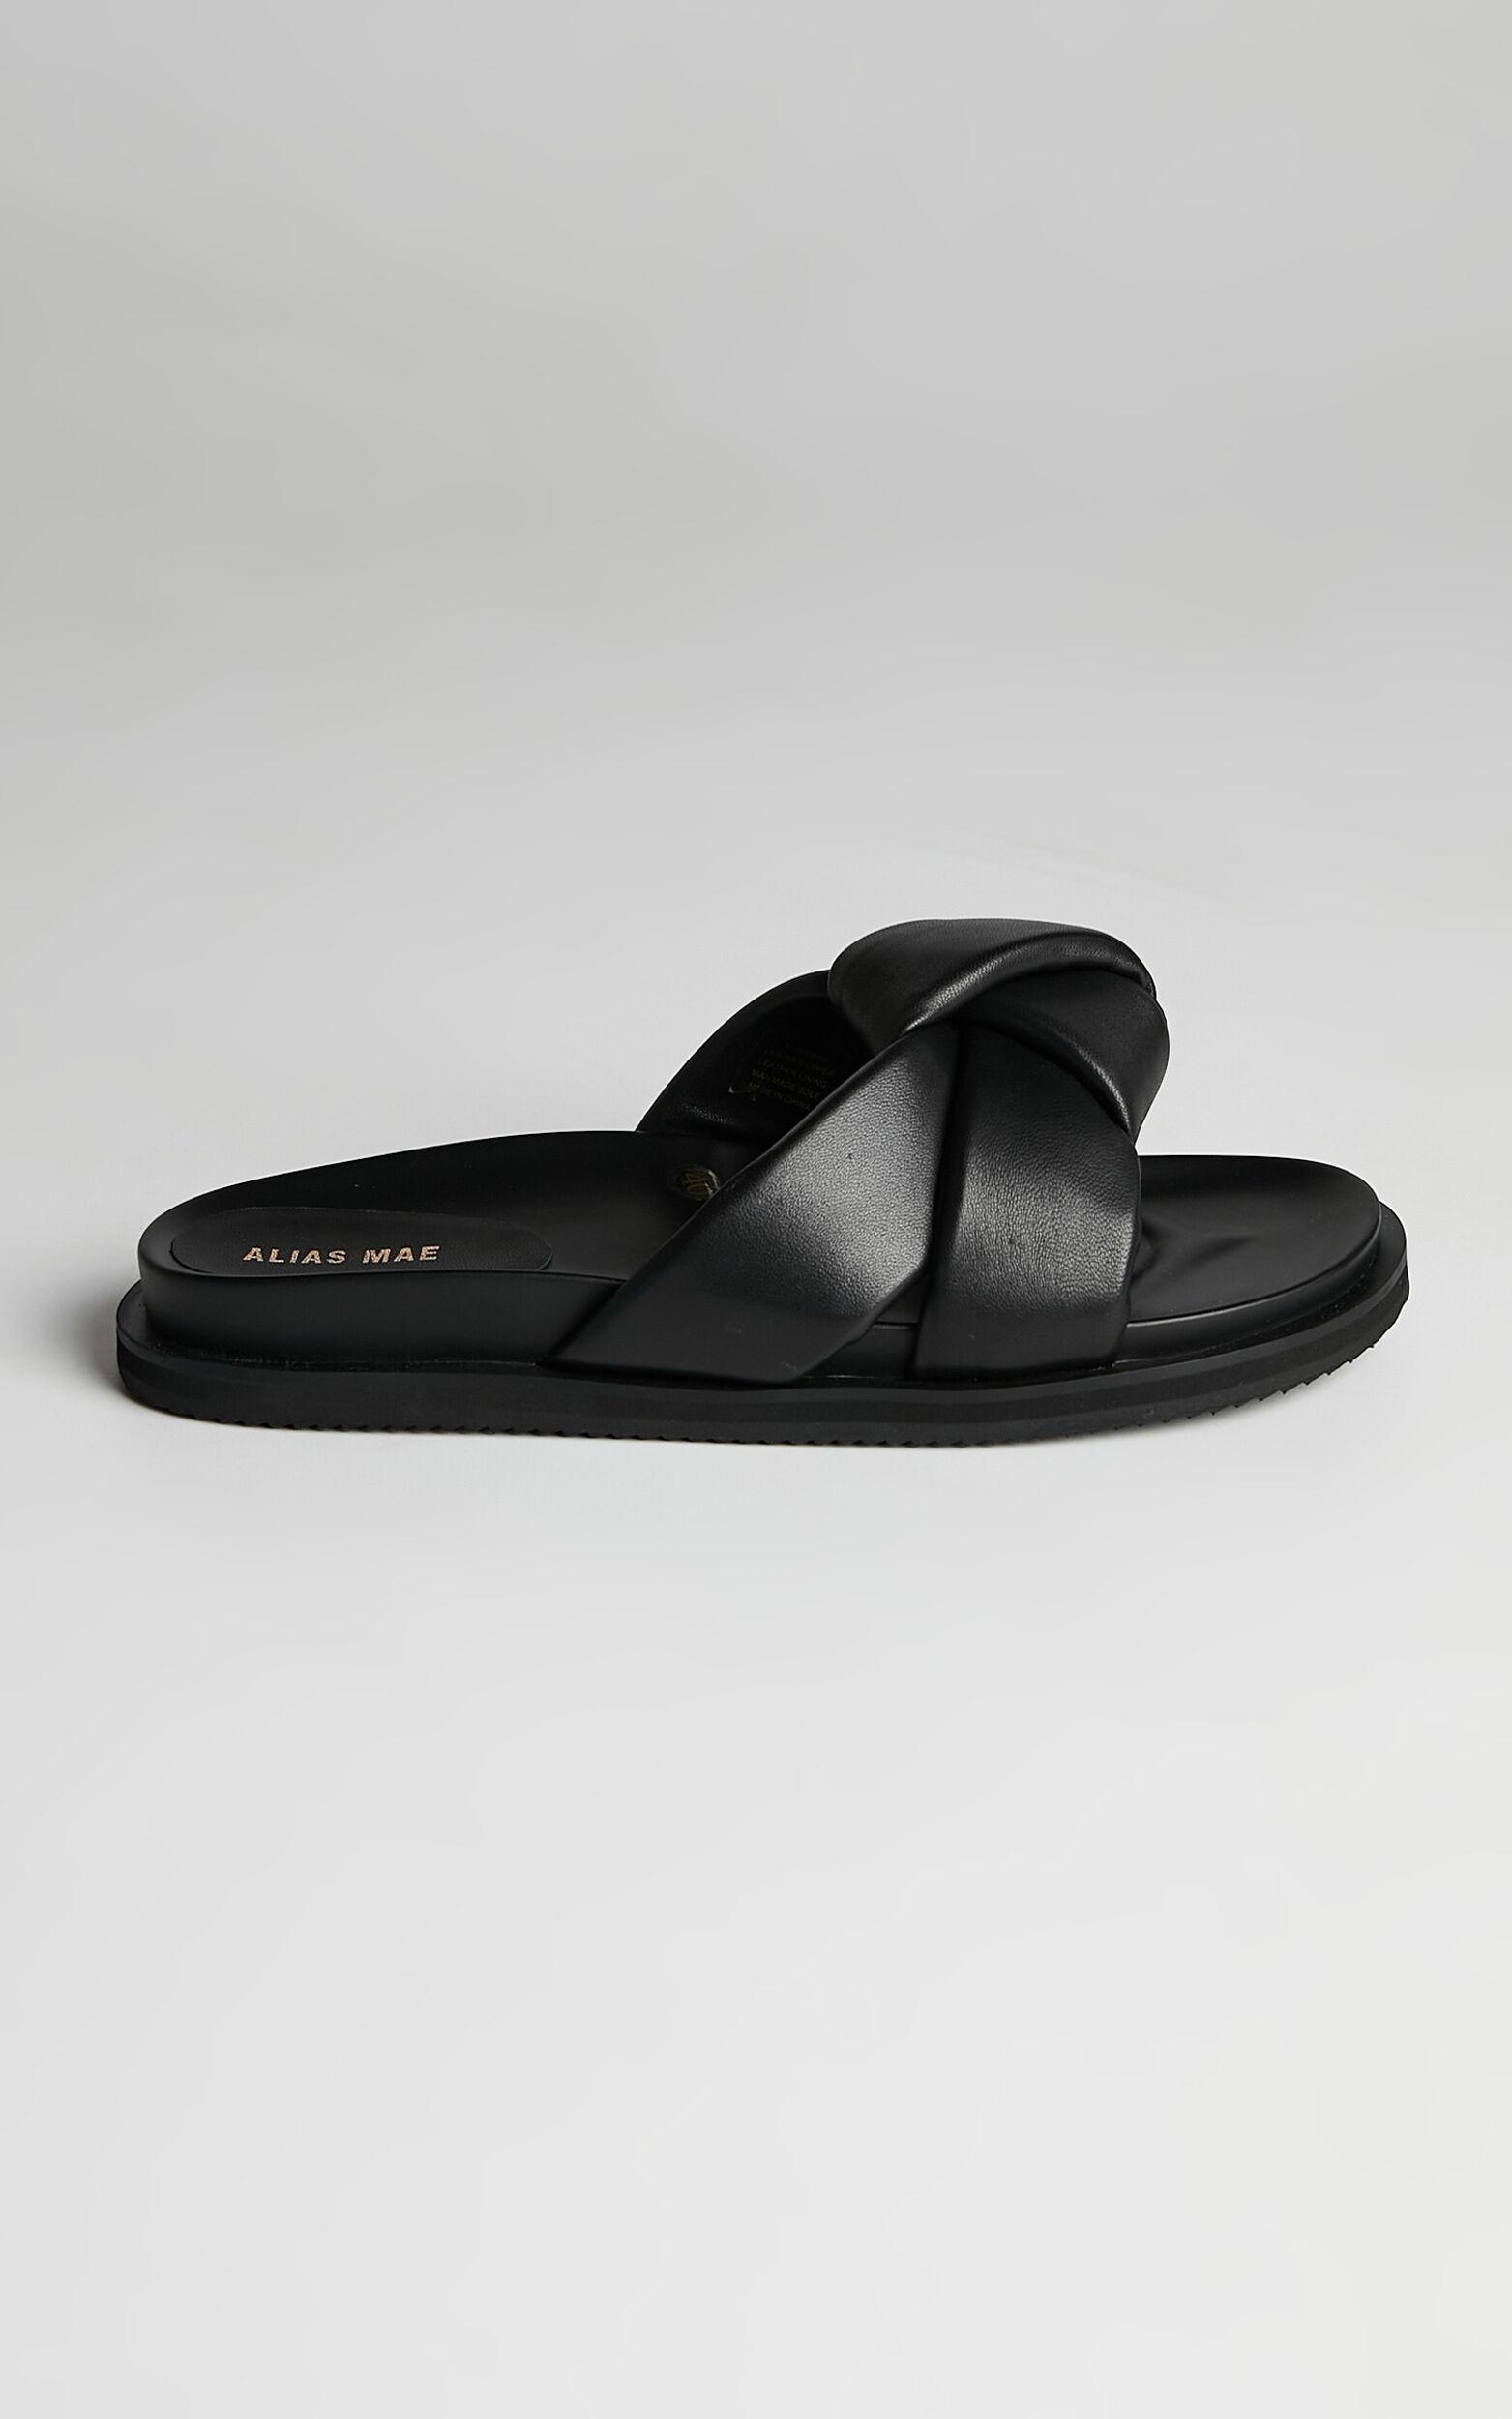 Alias Mae - Sofia Slides in Black Leather - 10.5, BLK1, super-hi-res image number null